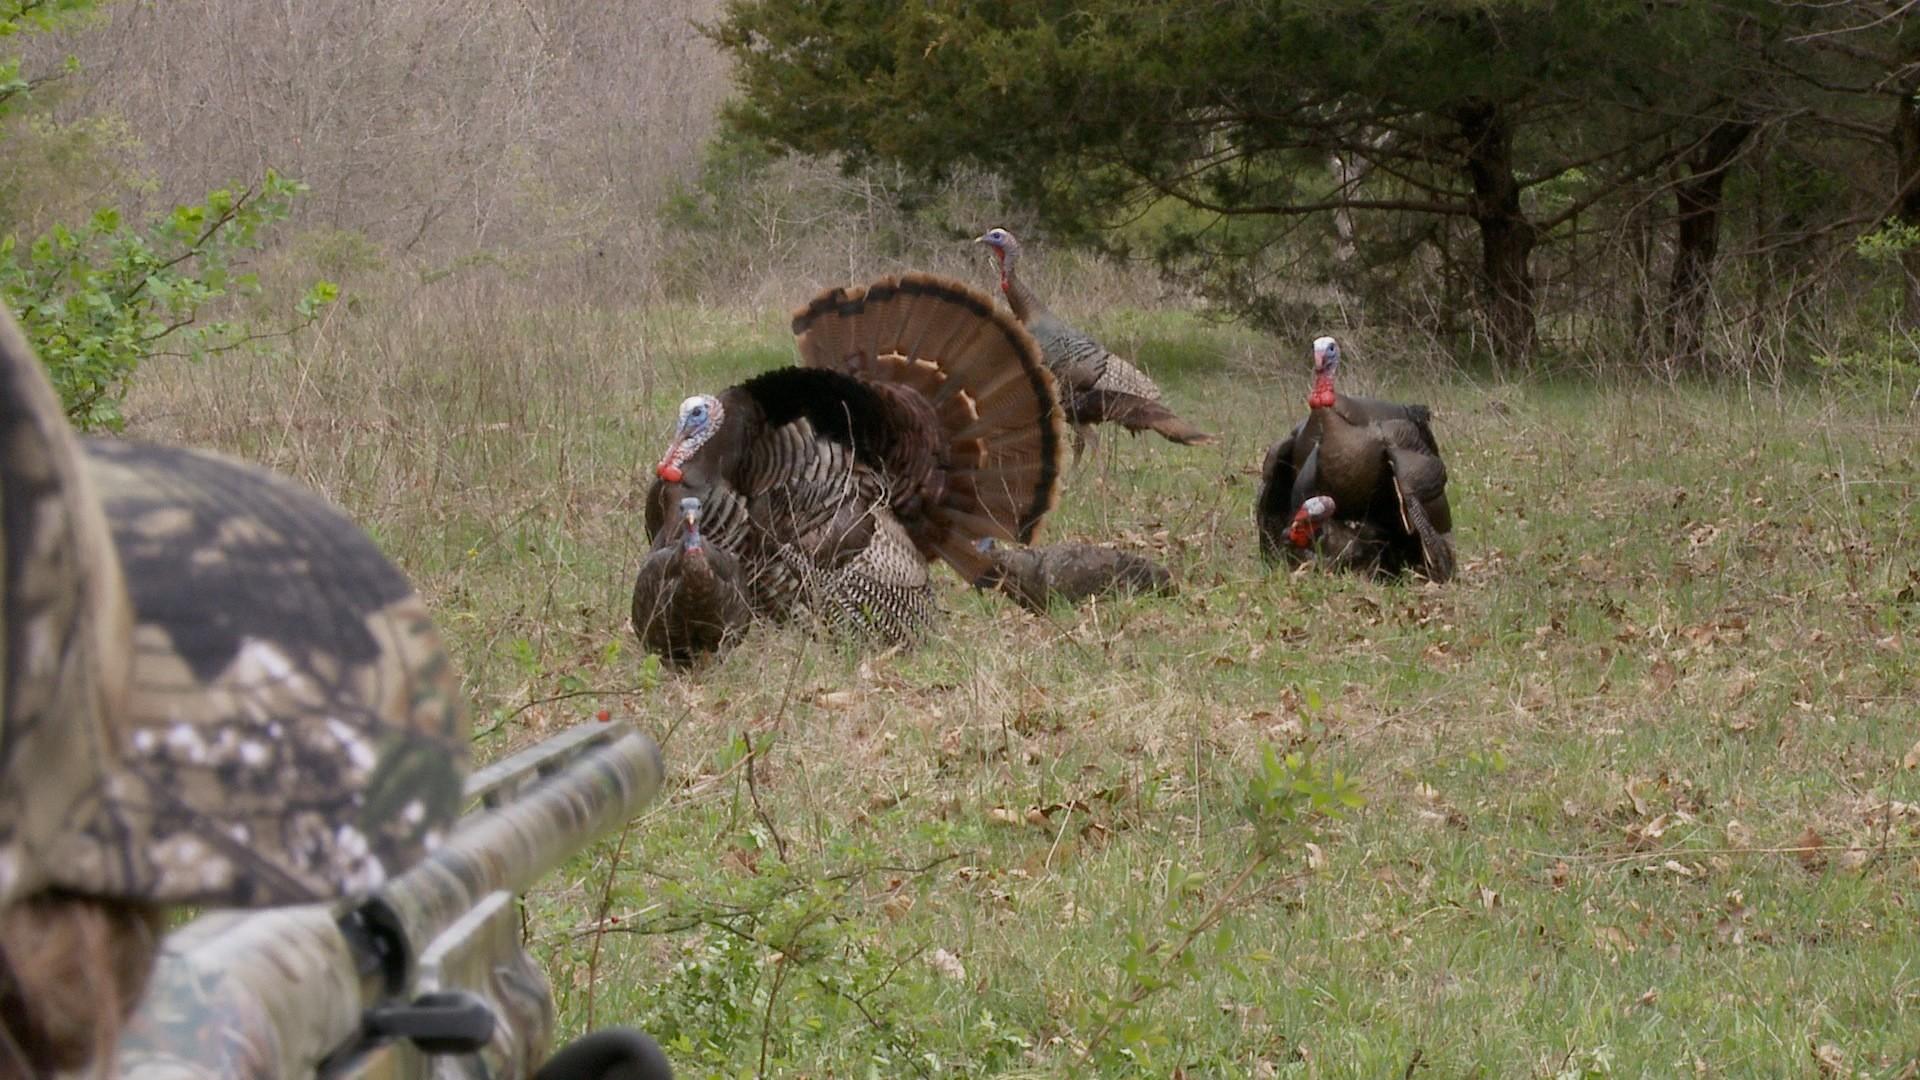 1920x1080 Wild Turkey HQFX Photos